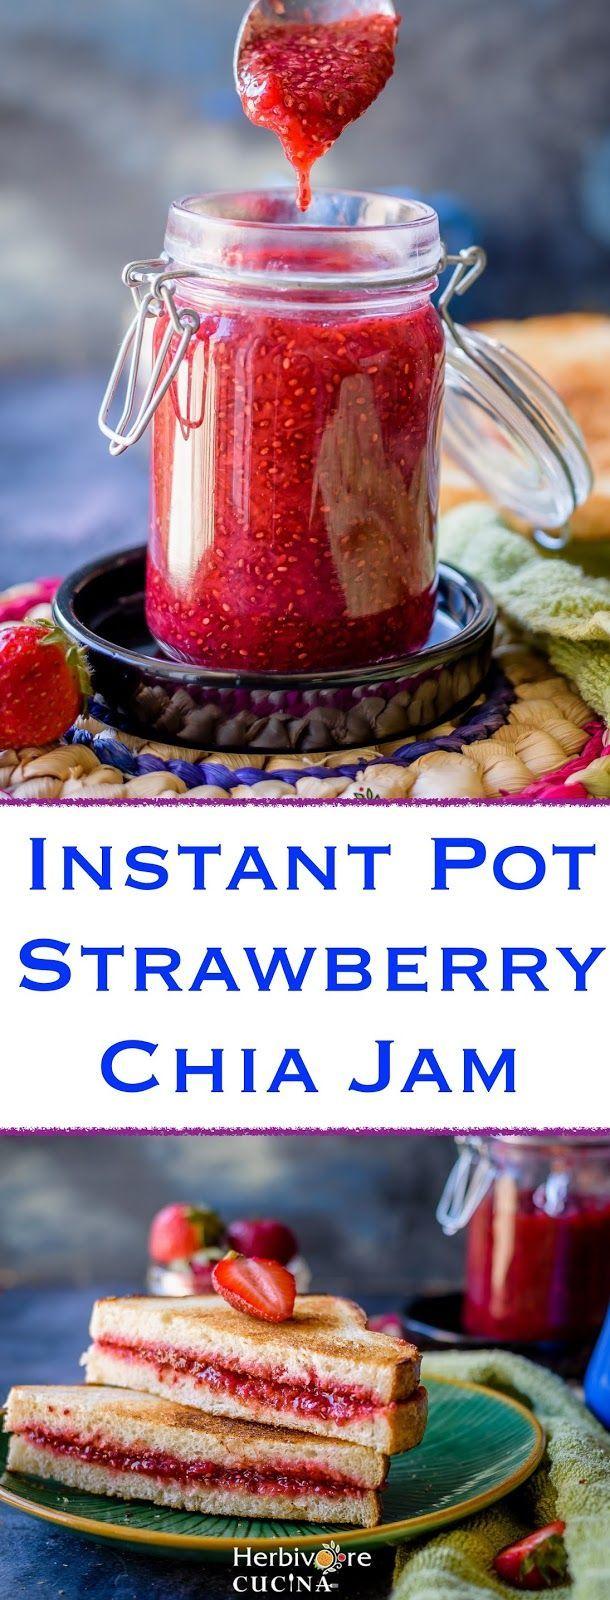 Instant Pot Strawberry Chia Jam